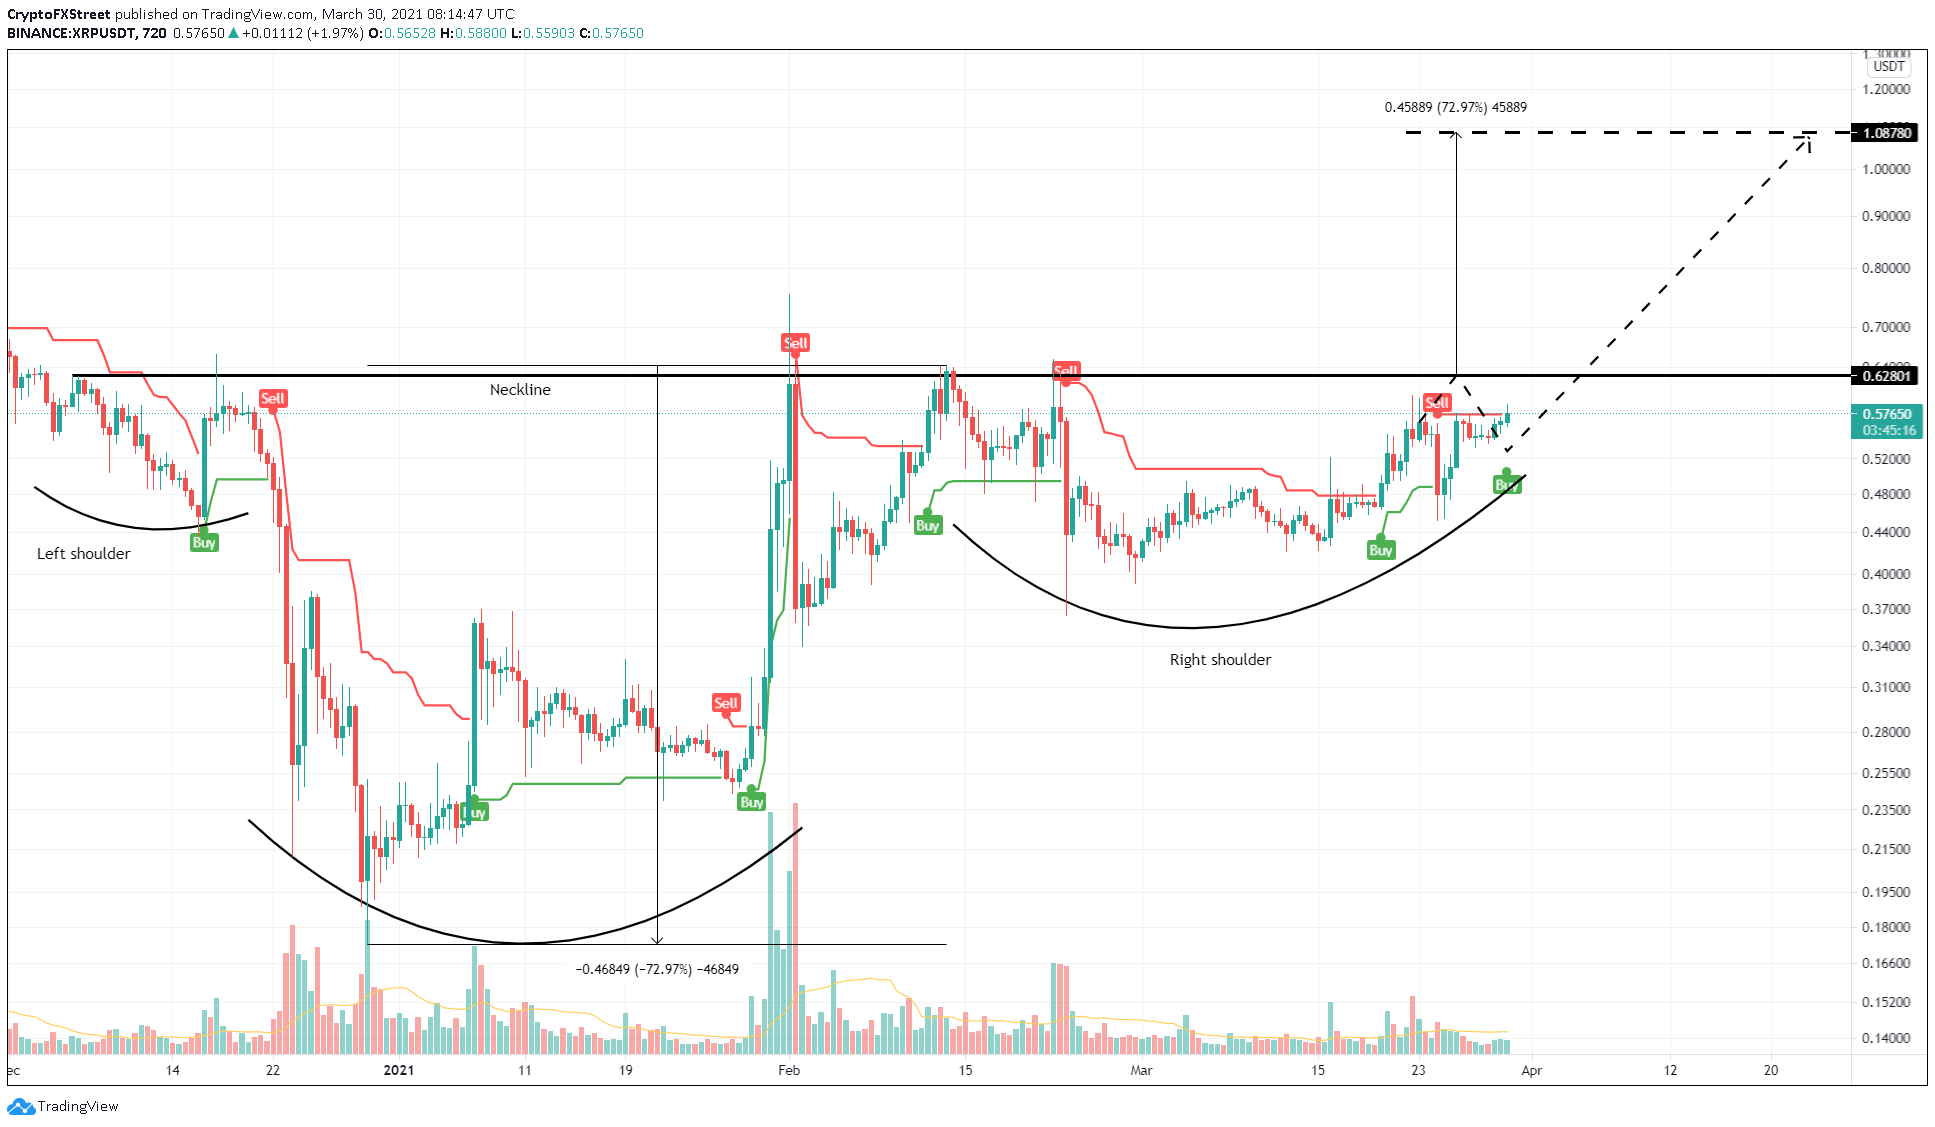 XRP/USDT 12-hour chart